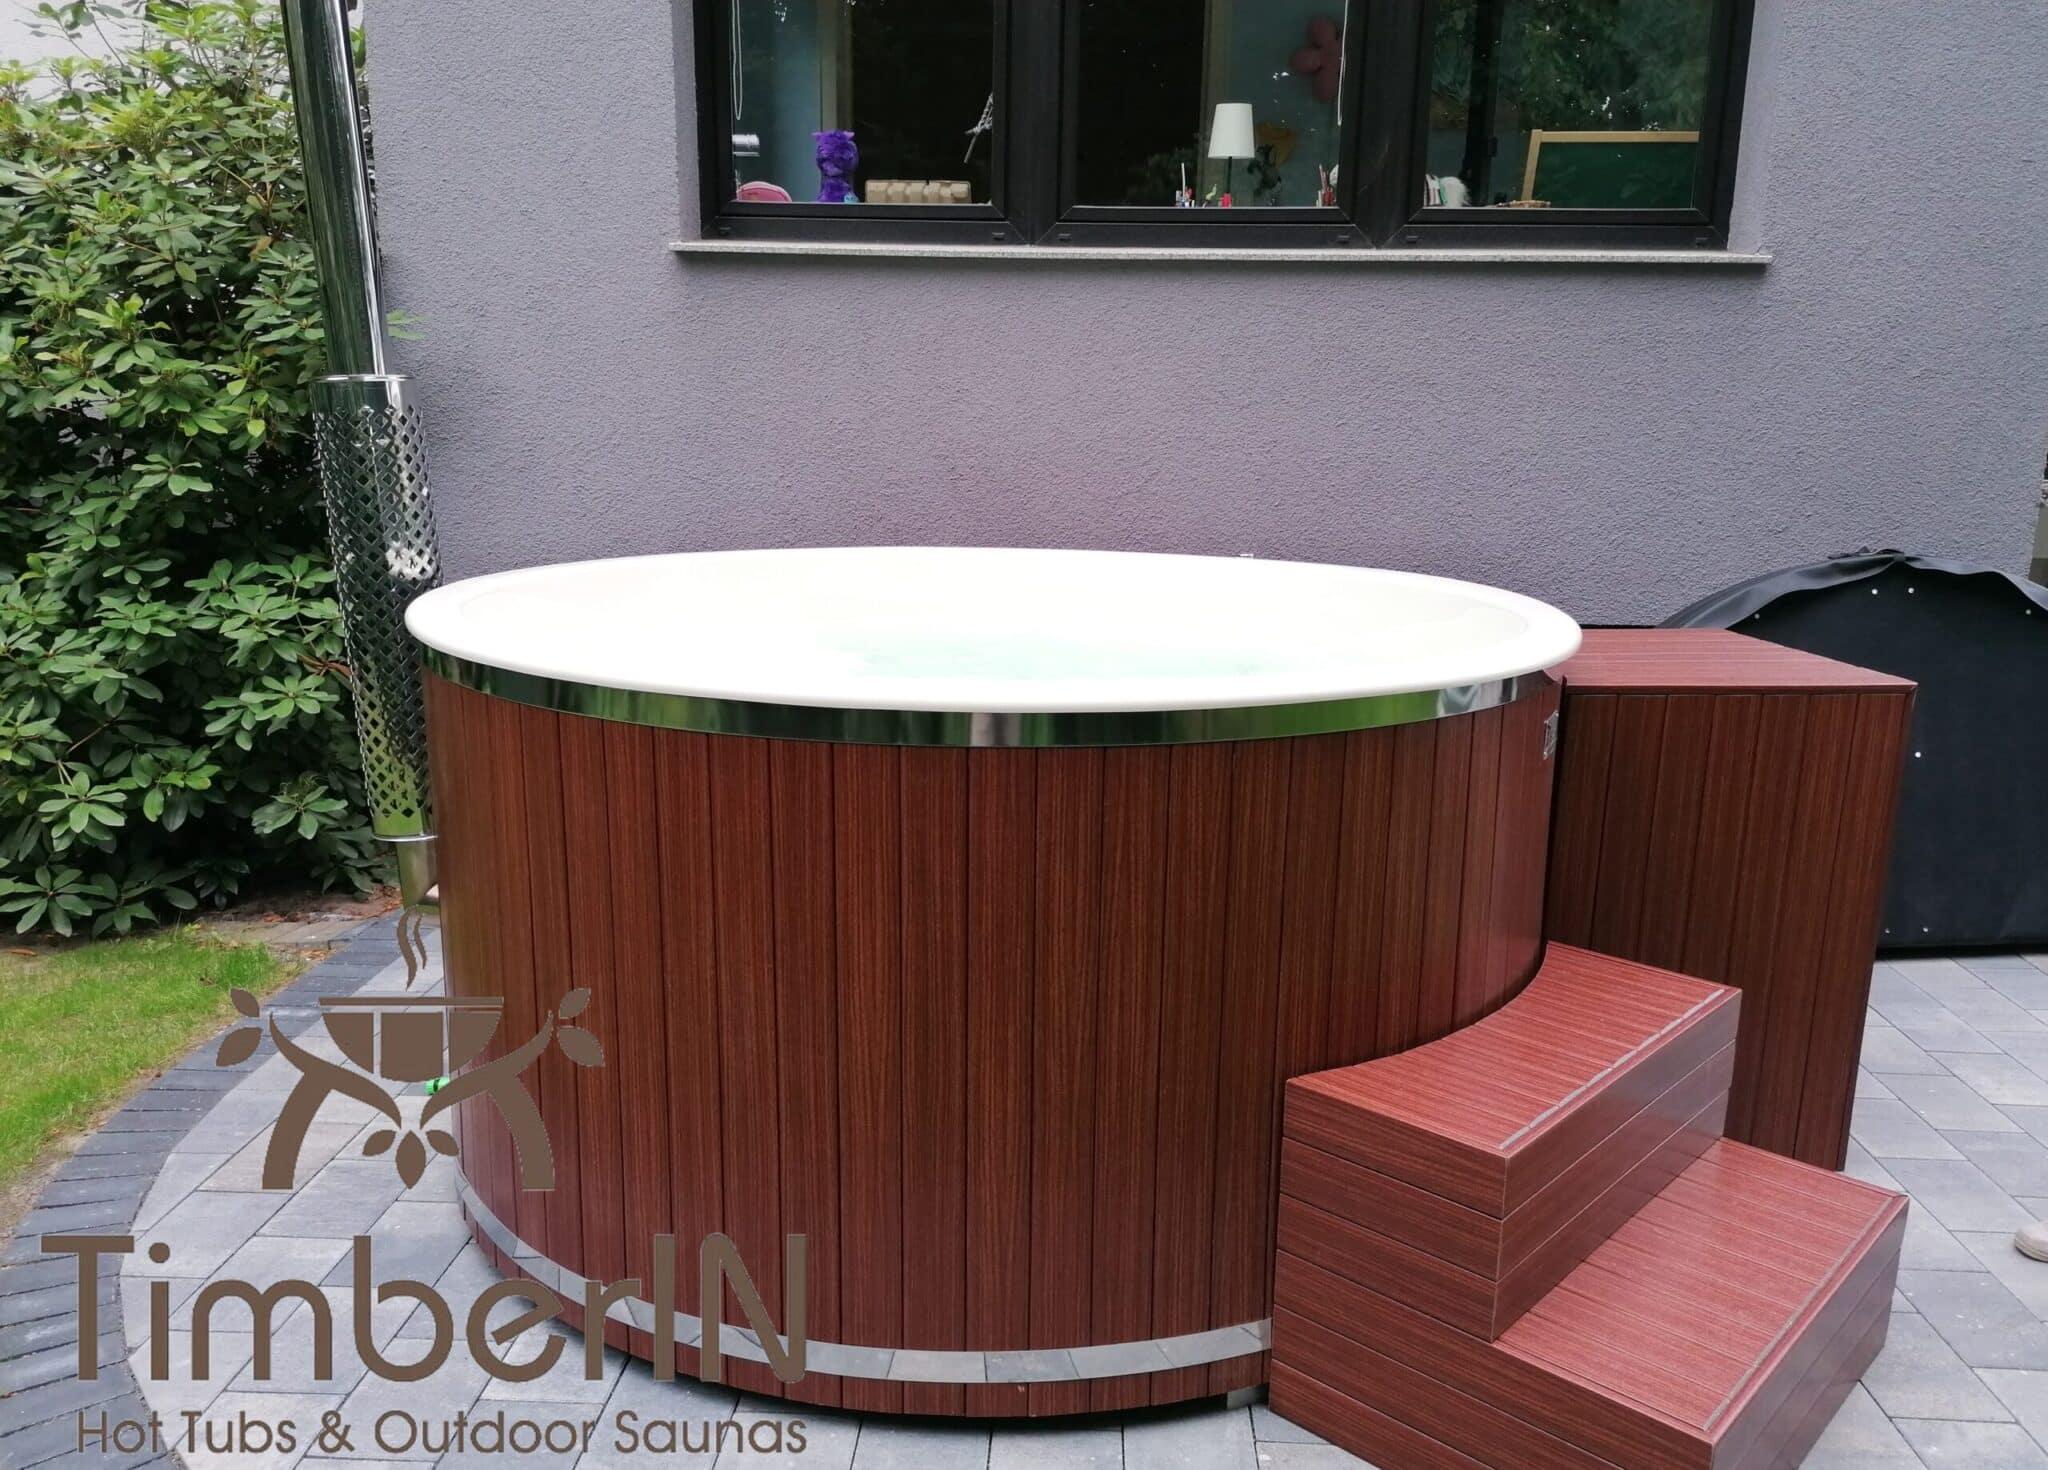 Badezuber Badefass GFK WPC – Thermoholz Verkleidung mit SMART Pellet oder Holzofen 2 1 scaled